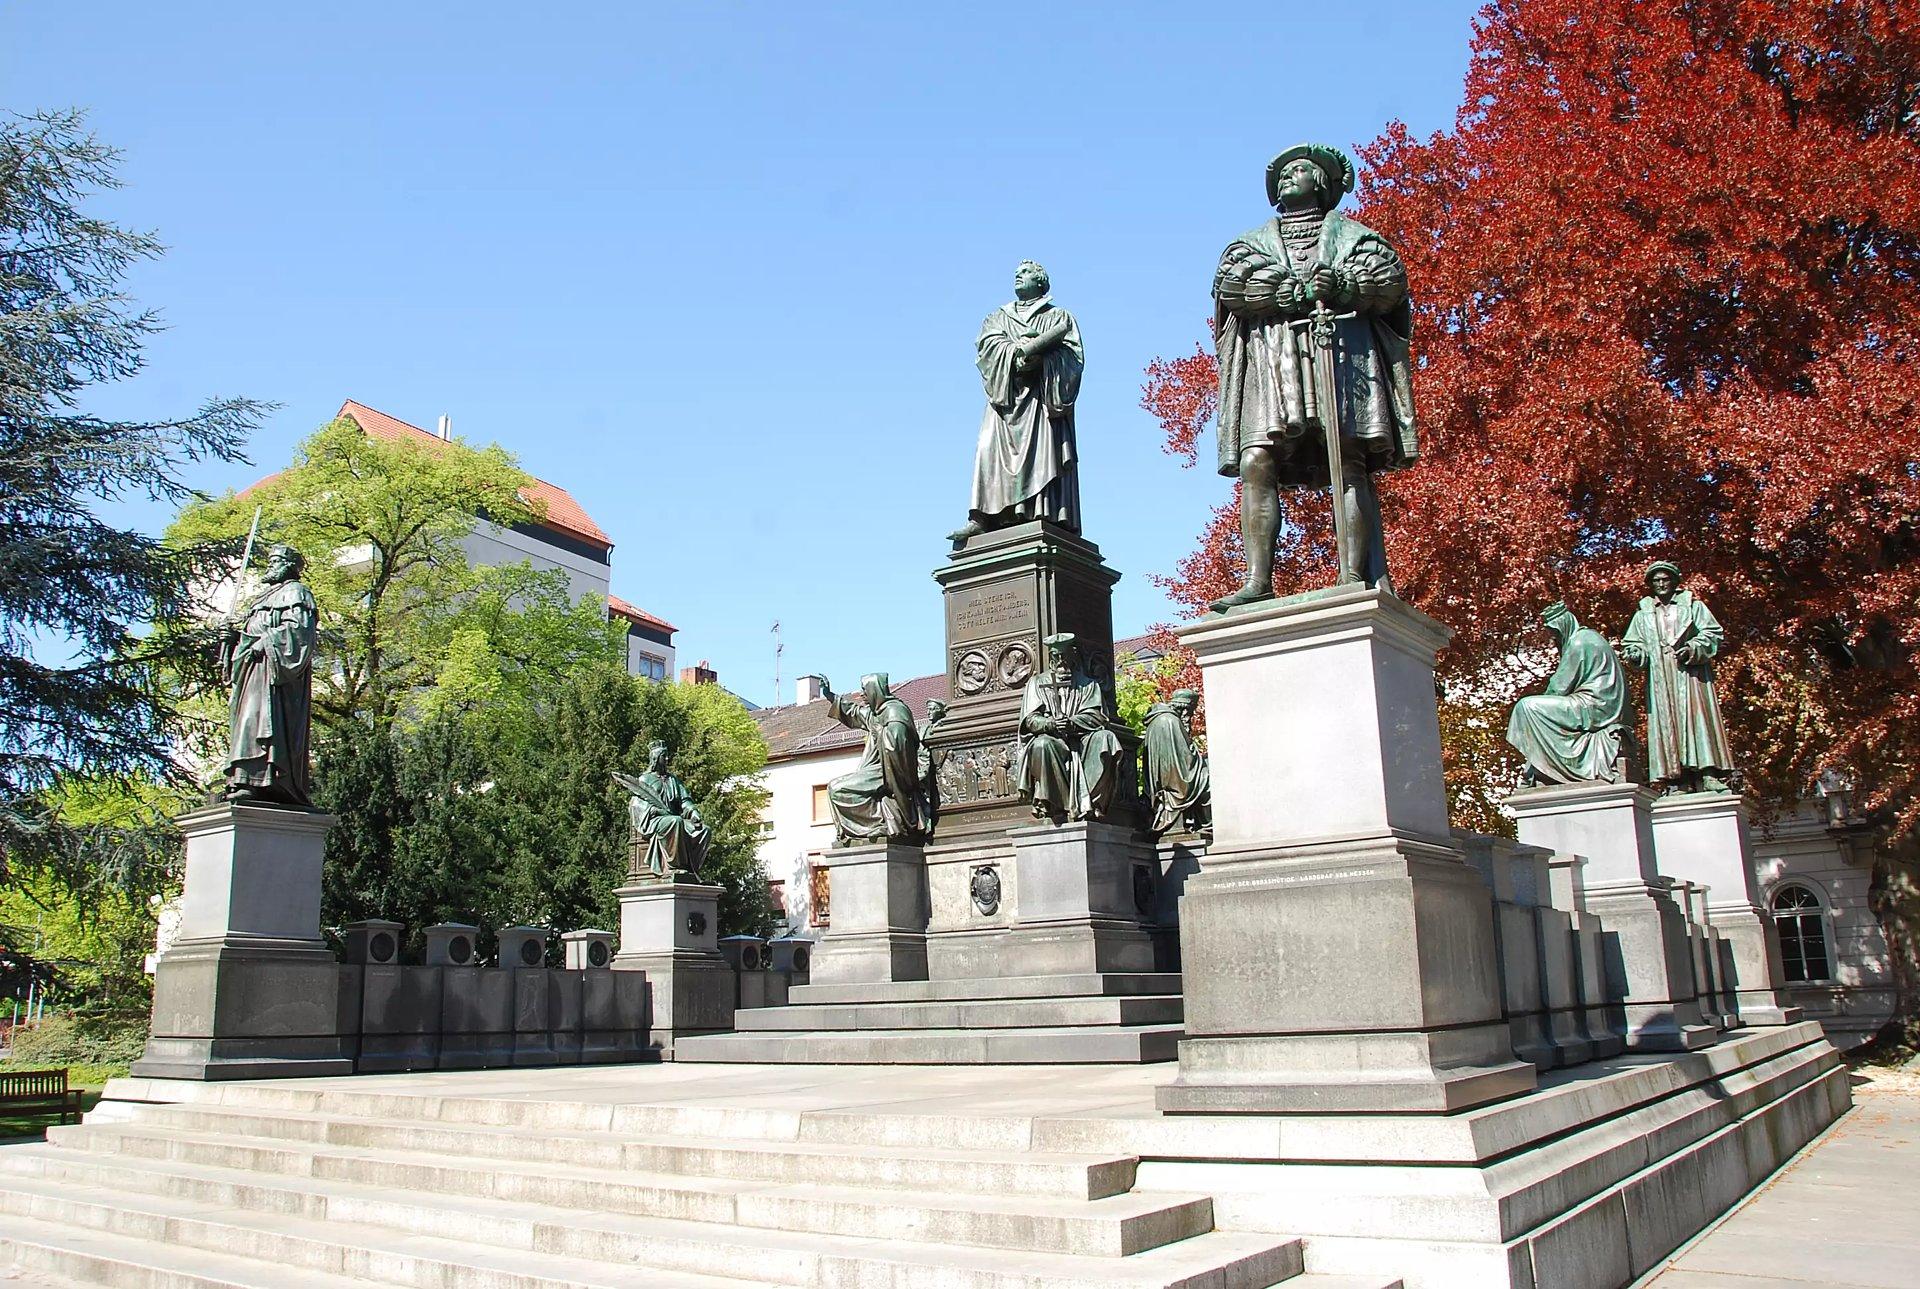 Das Lutherdenkmal in Worms, Lutherstadt